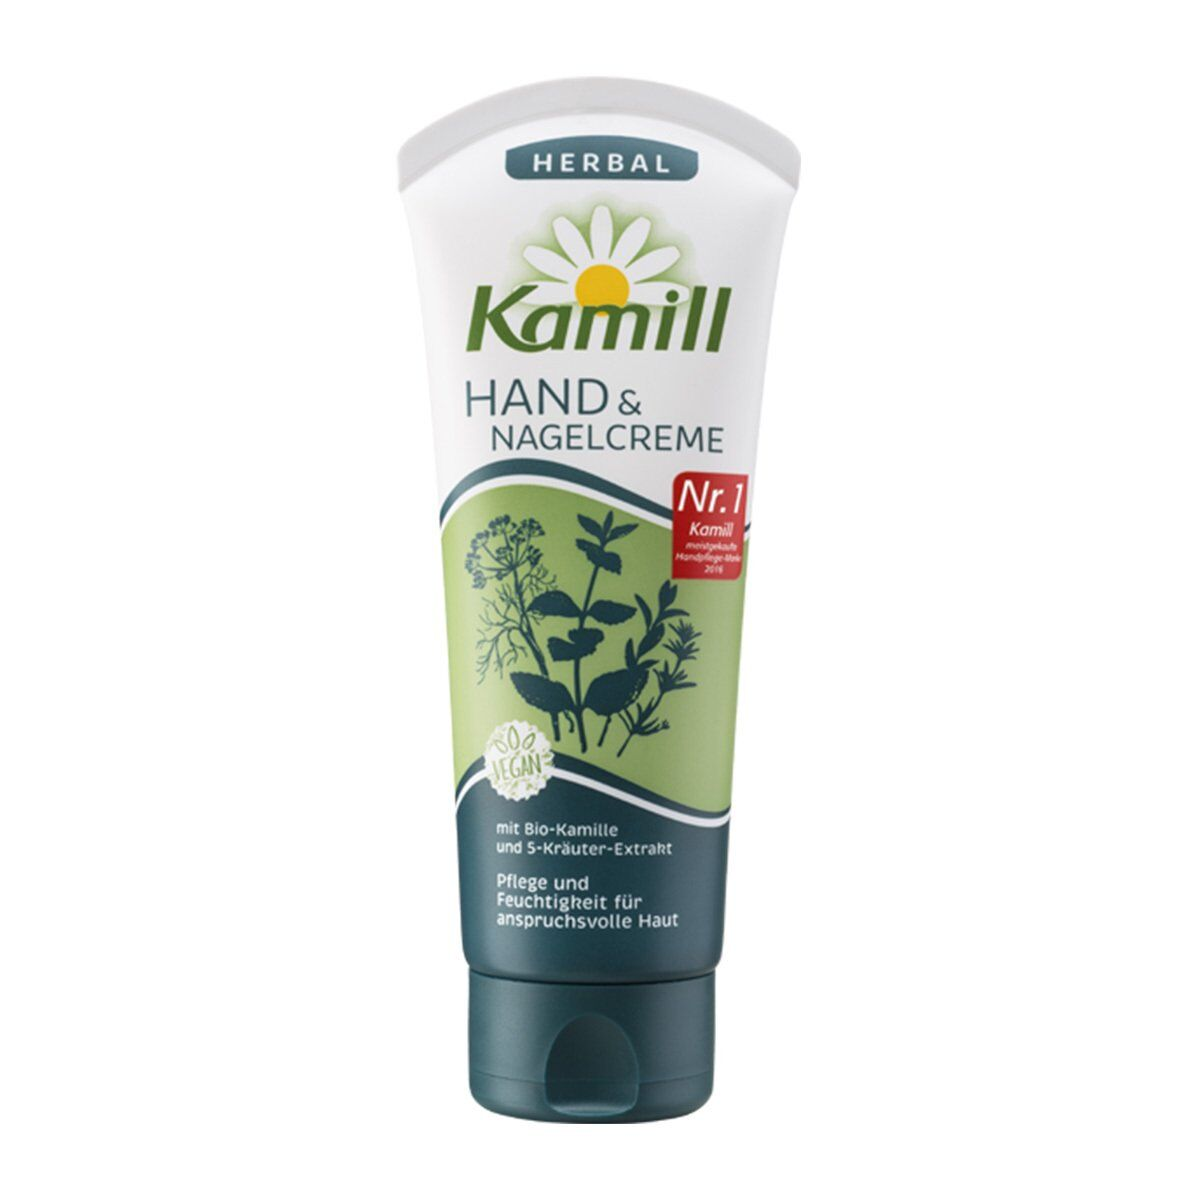 Kamill - Herbal Hand + Nail Cream